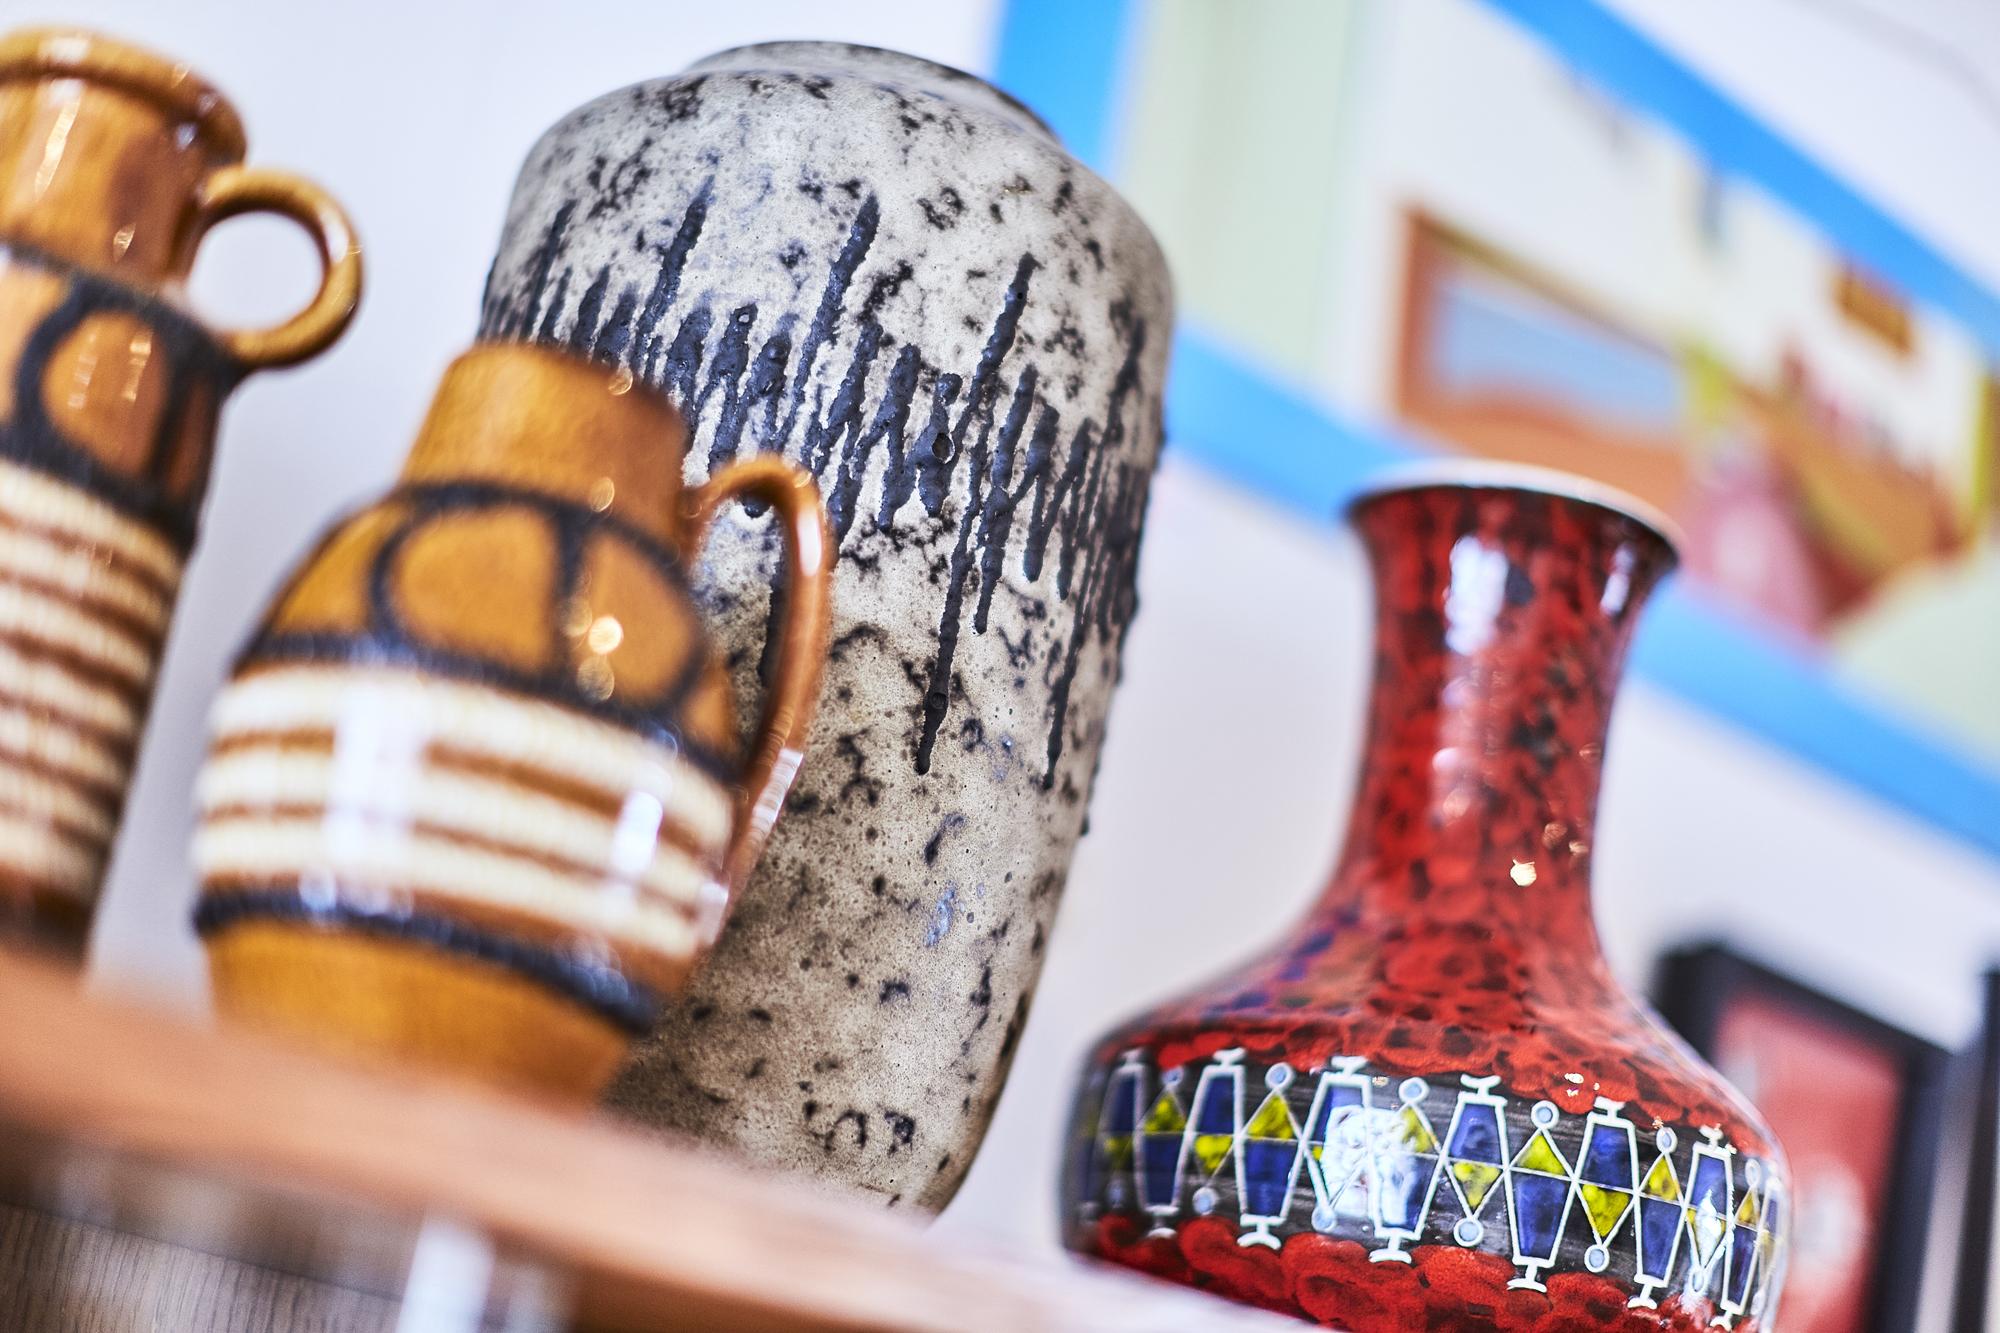 15-collingwood-ceramics.jpg